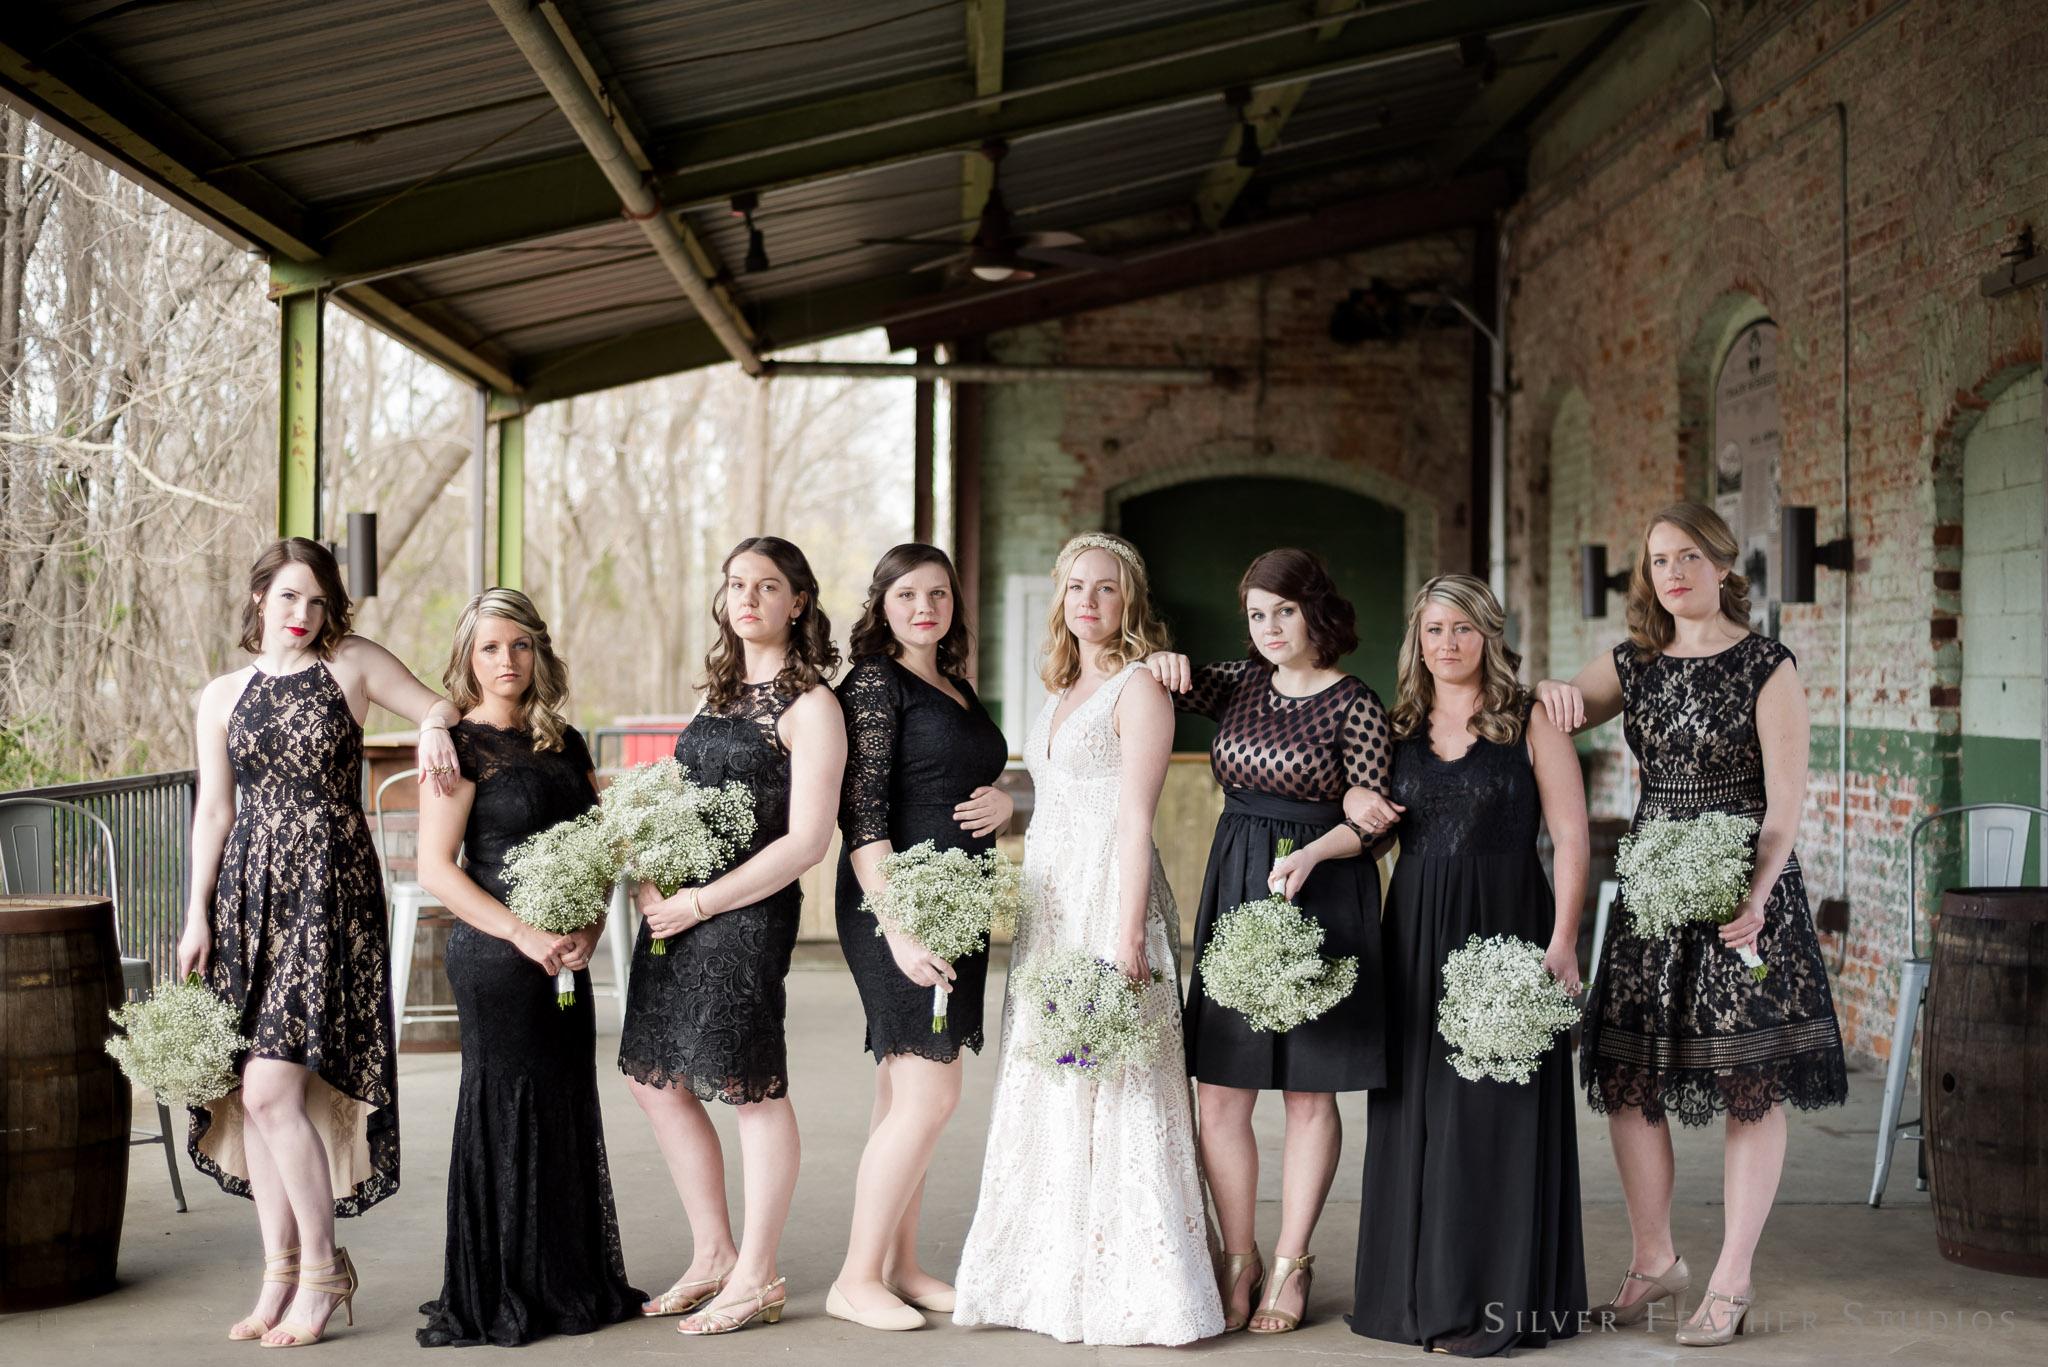 cotton-room-wedding-photography-021.jpg